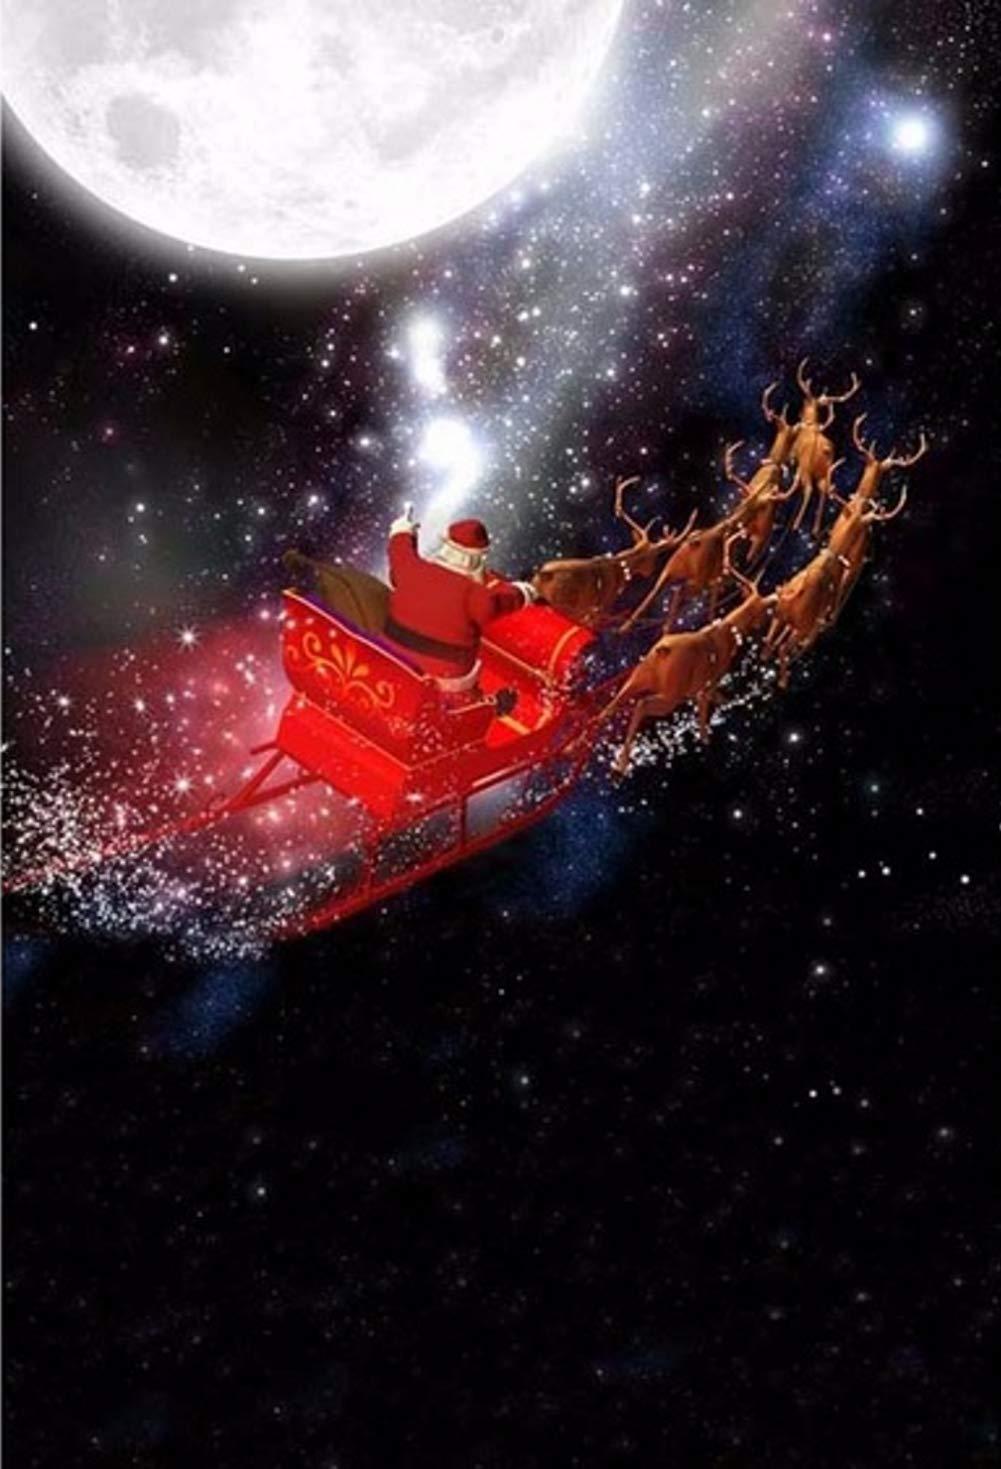 Gardenia 5x7フィート クリスマス 背景 写真 背景 サンタクロース ライド トナカイ クリスマス 街 満月 夜 雪 空 夢 雪の結晶 冬 祭り 年背景   B07K9S3YYP